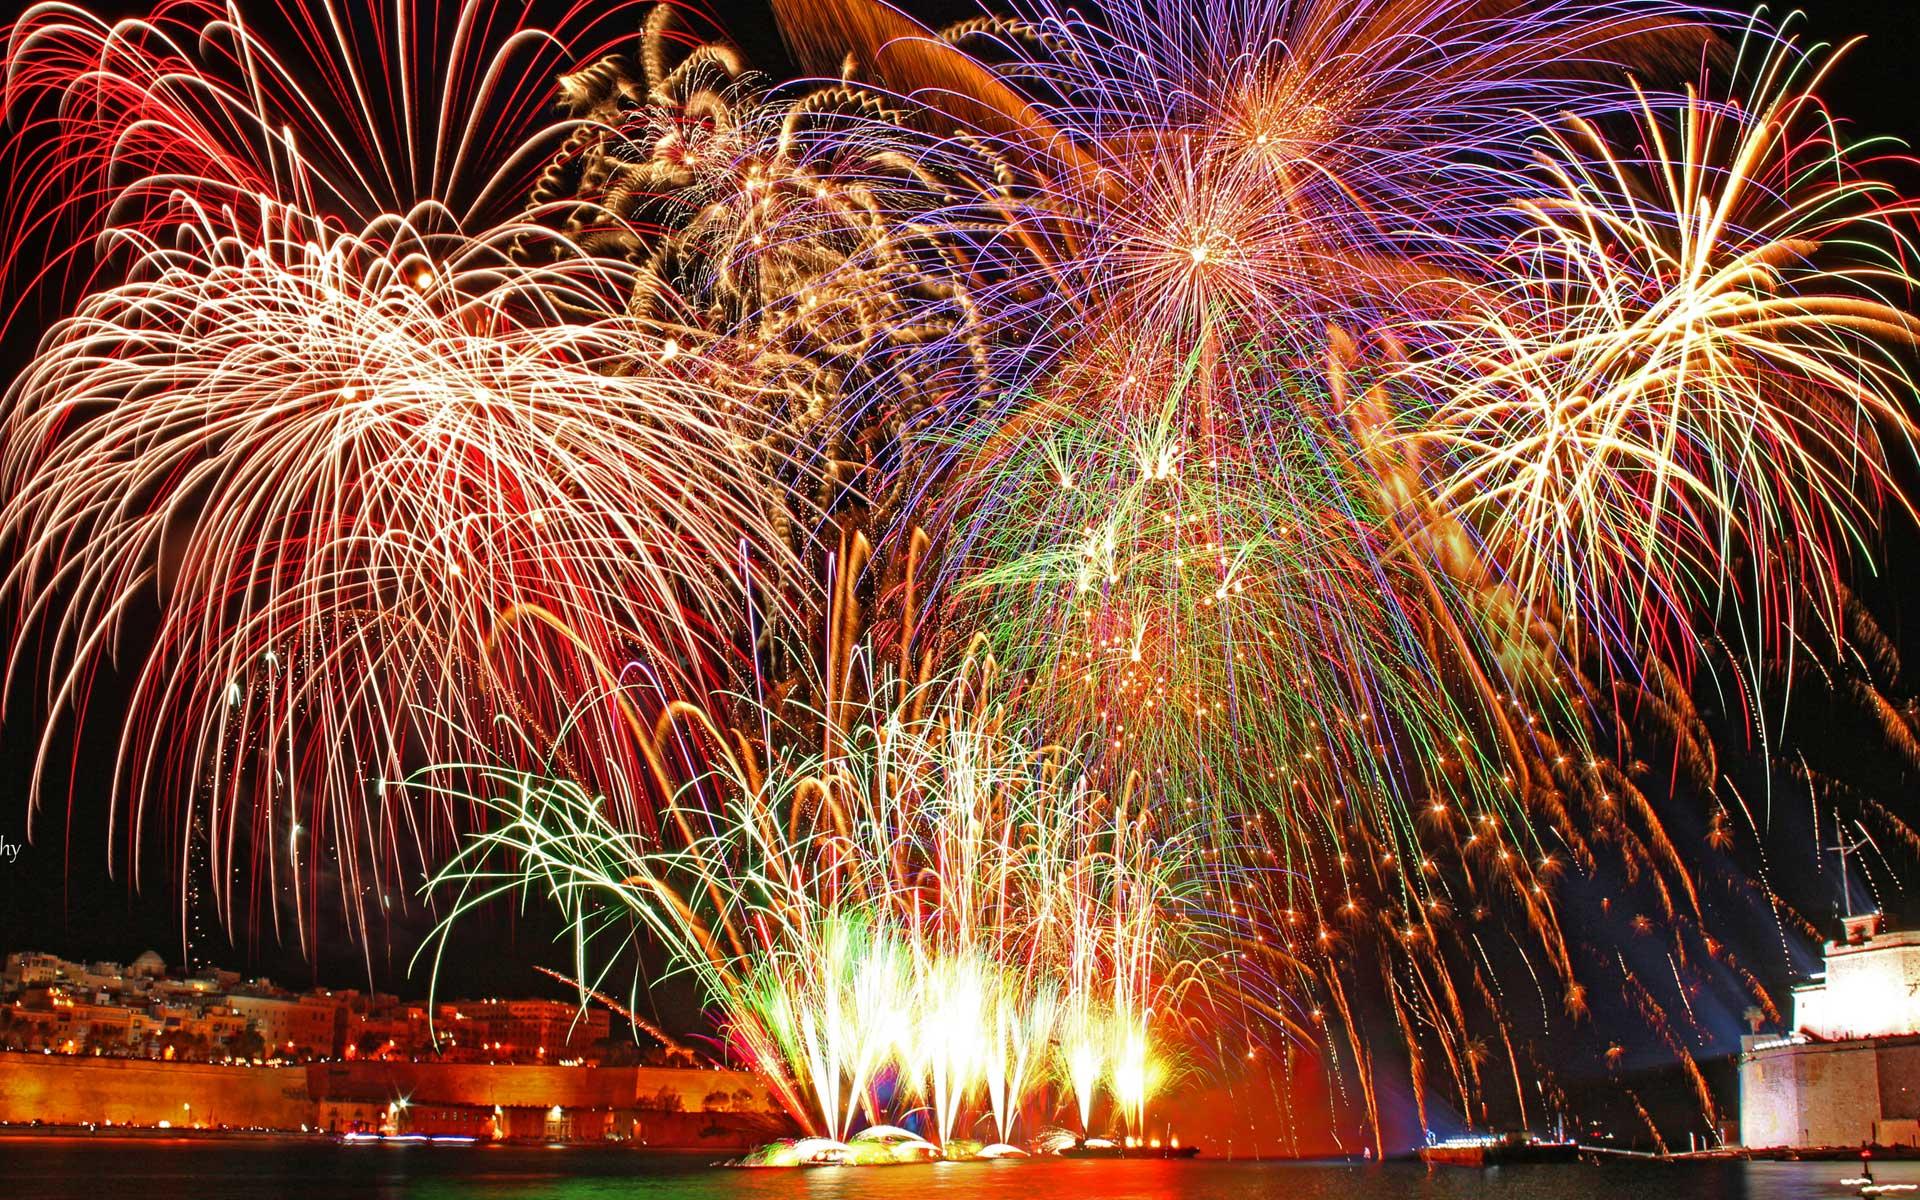 Fireworks New Year Wallpaper HD 27199   Baltana 1920x1200